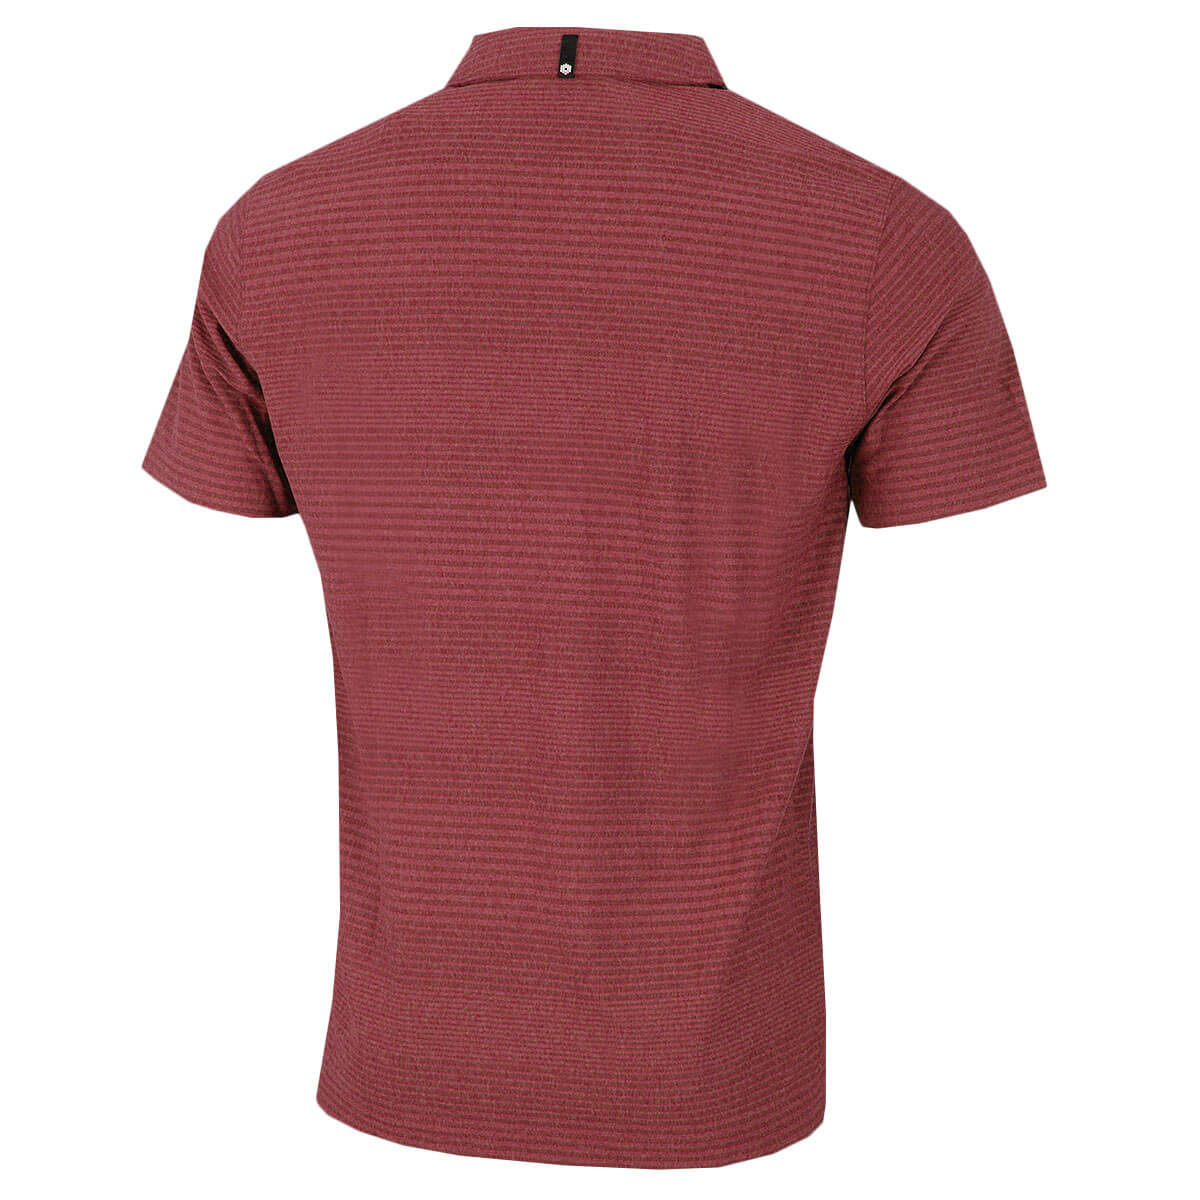 Puma-Golf-Mens-Aston-DRYCELL-UPF-50-Moisture-Wicking-Polo-Shirt-45-OFF-RRP thumbnail 9